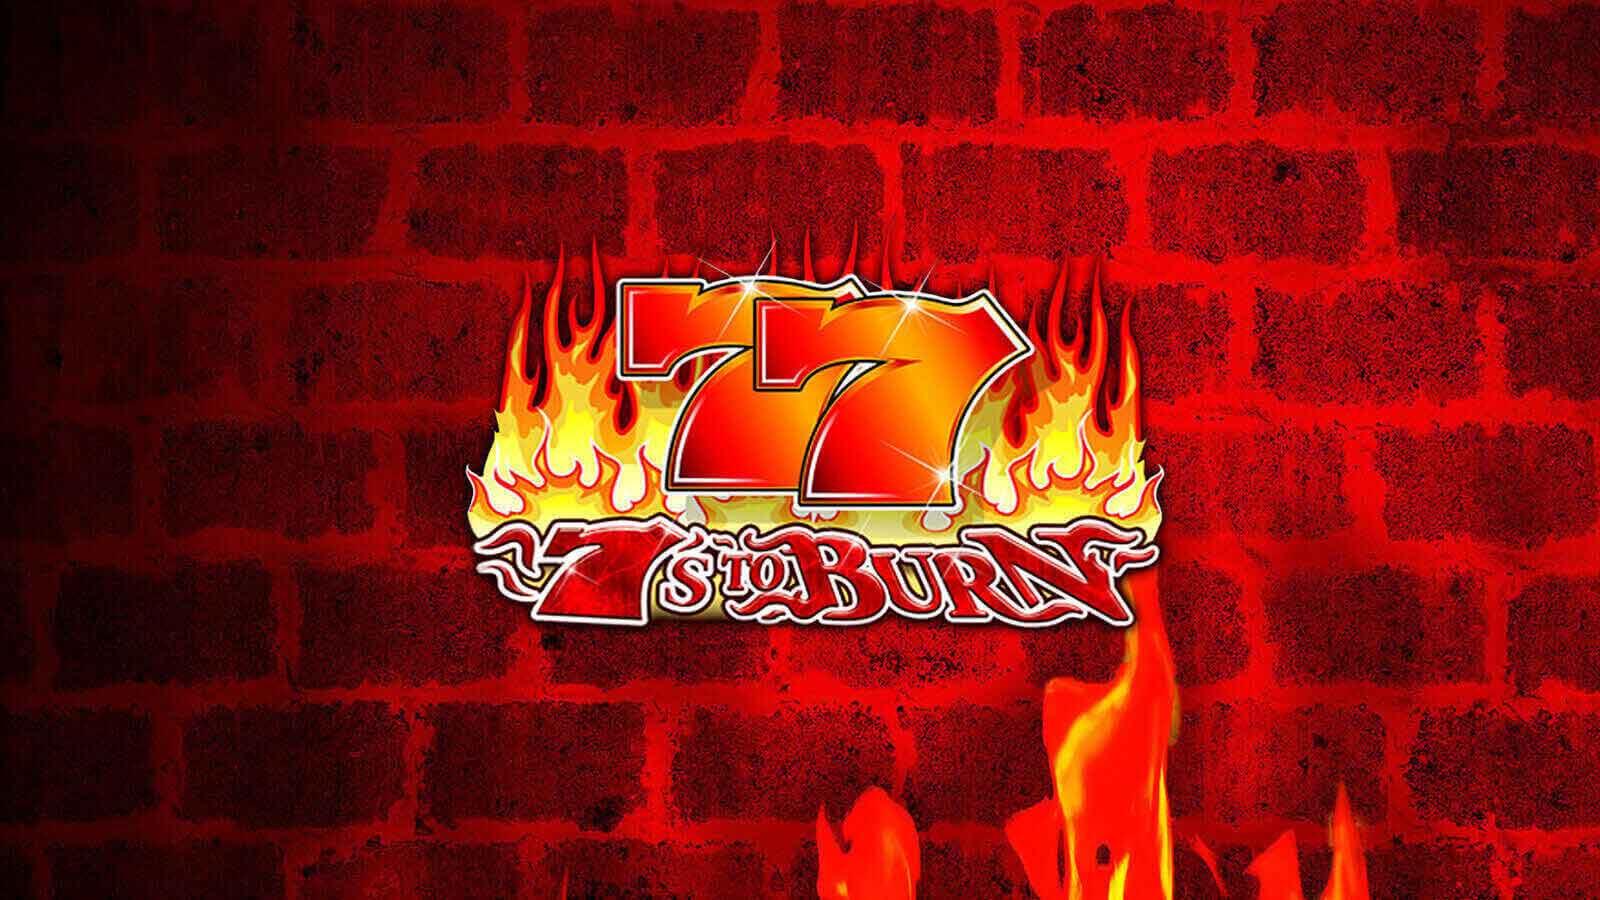 7s To Burn Logo Slot